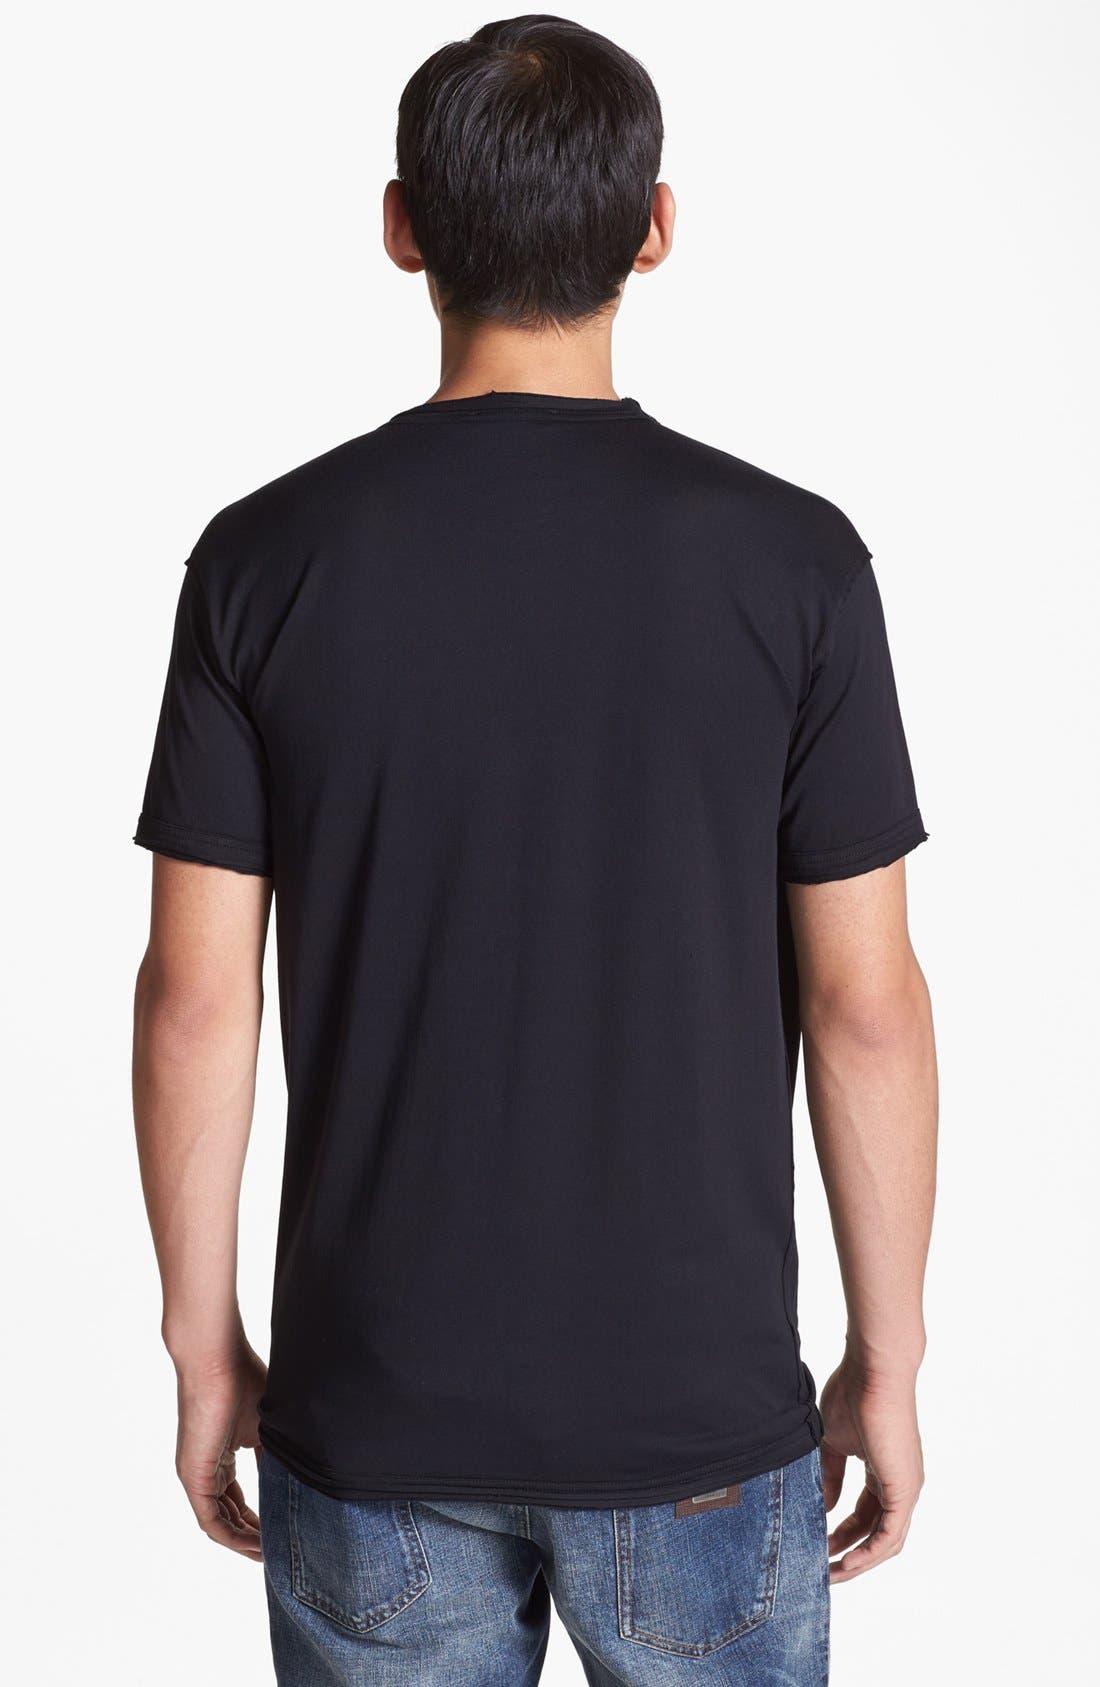 'Cassius Clay' T-Shirt,                             Alternate thumbnail 2, color,                             001